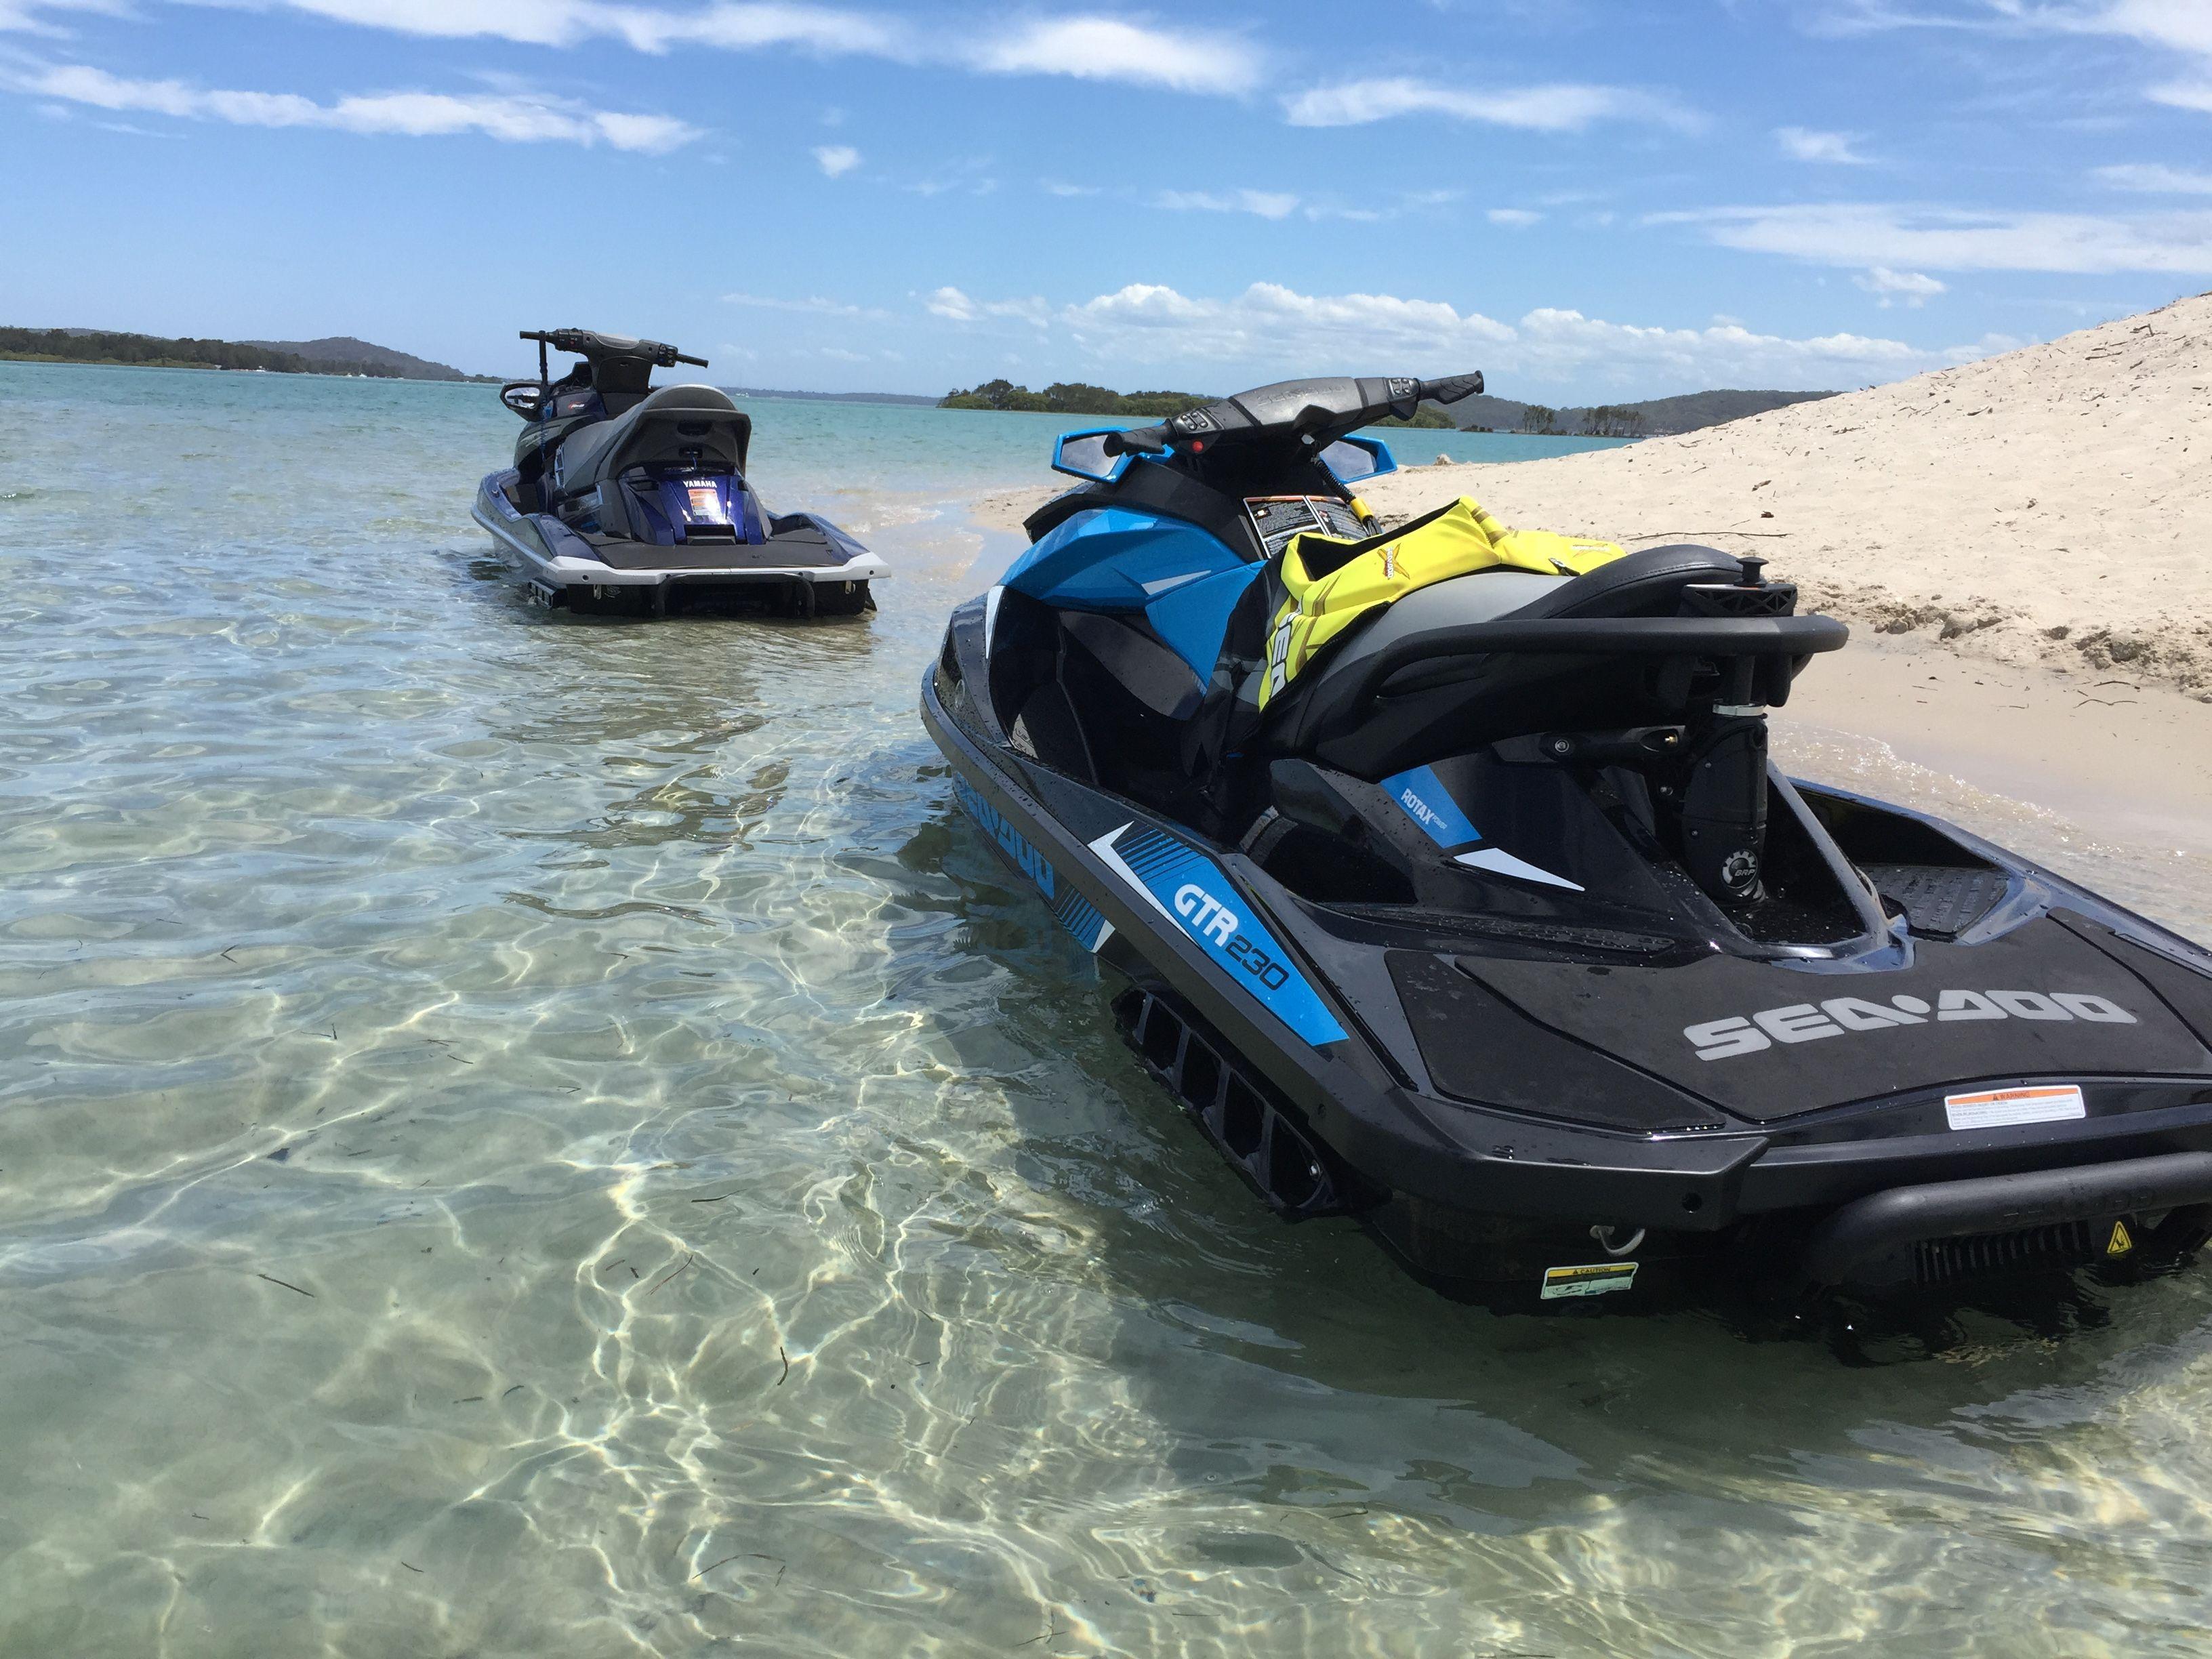 Funboataccessories Ski Boats Jet Ski Dream Cars Bmw